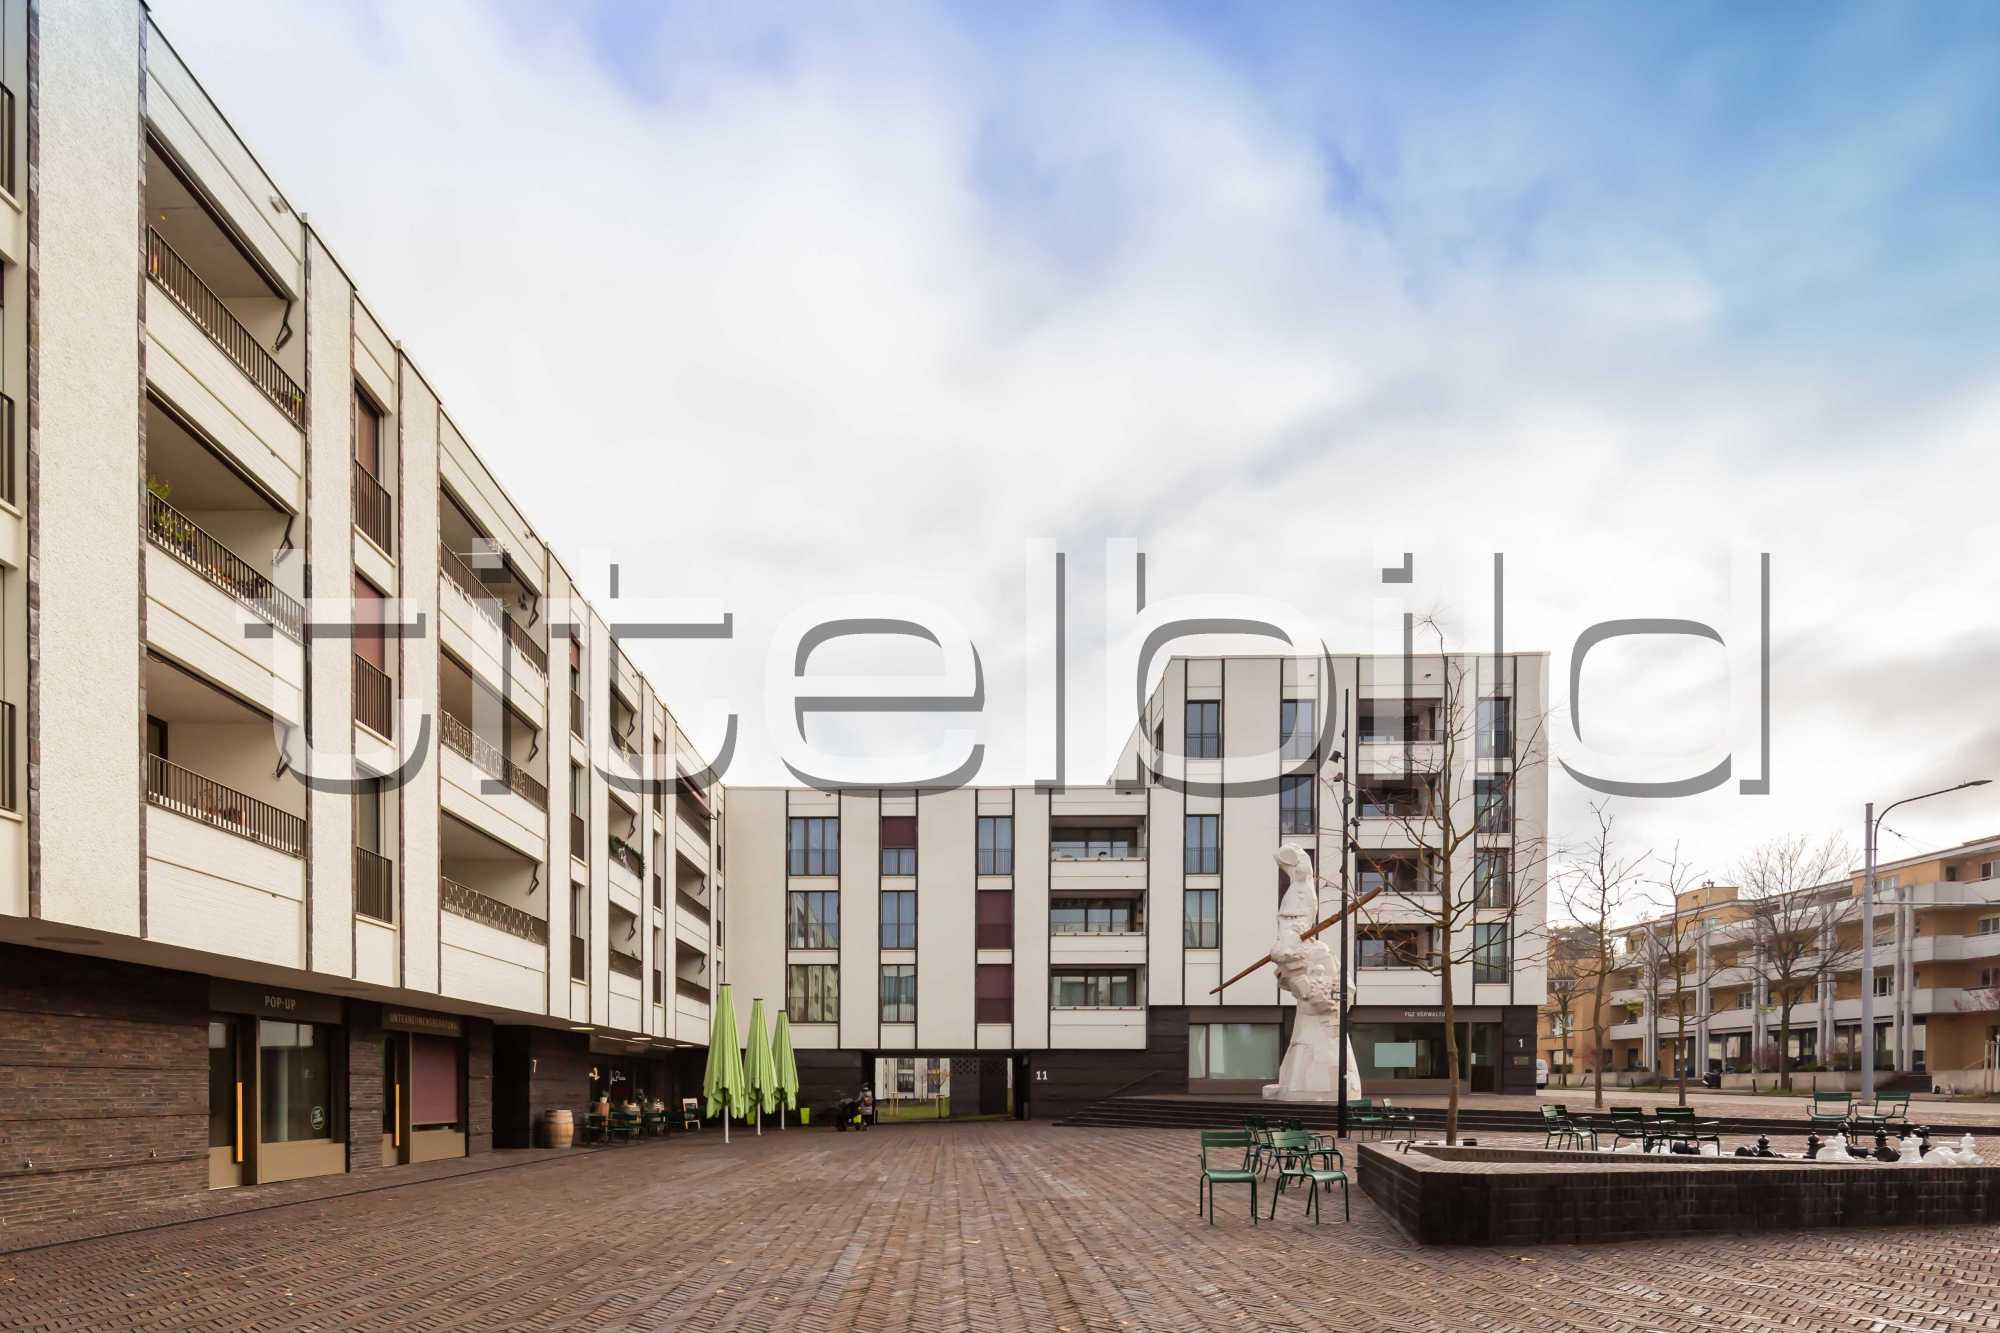 Projektbild-Nr. 3: Quartierzentrum Friesenberg